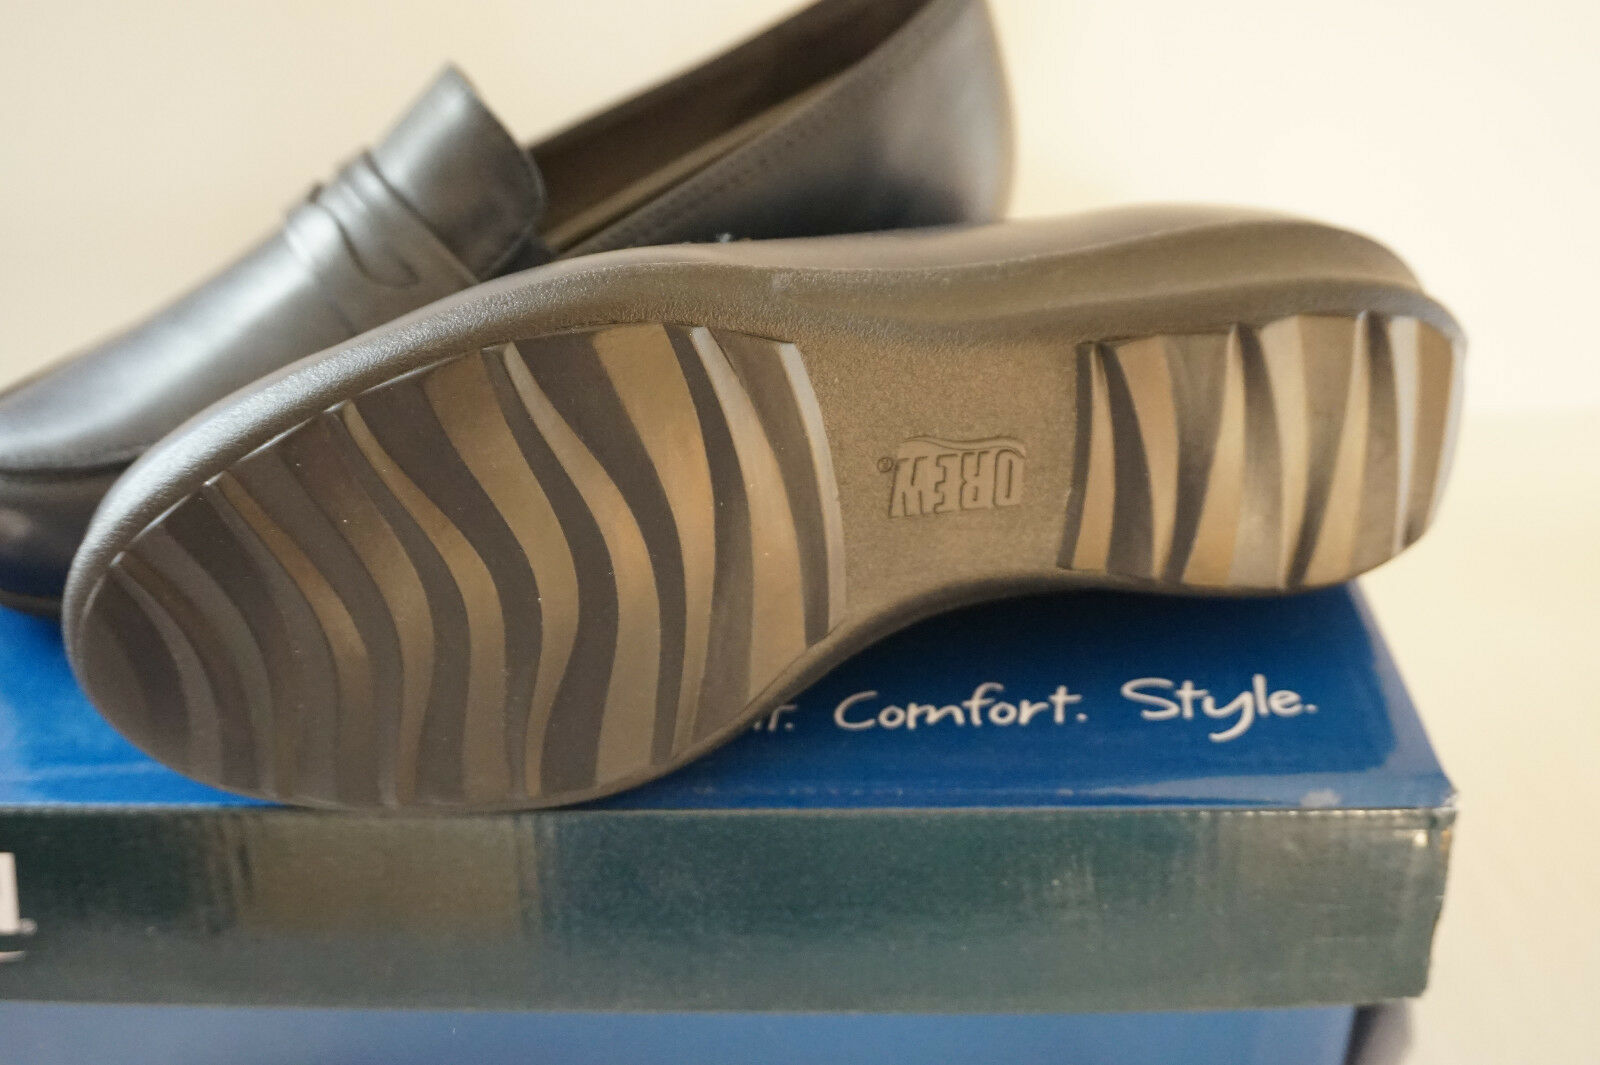 Drew Shoes Berlin Women's Therapeutic Diabetic Extra Depth Shoe 8.5 MSRP 144